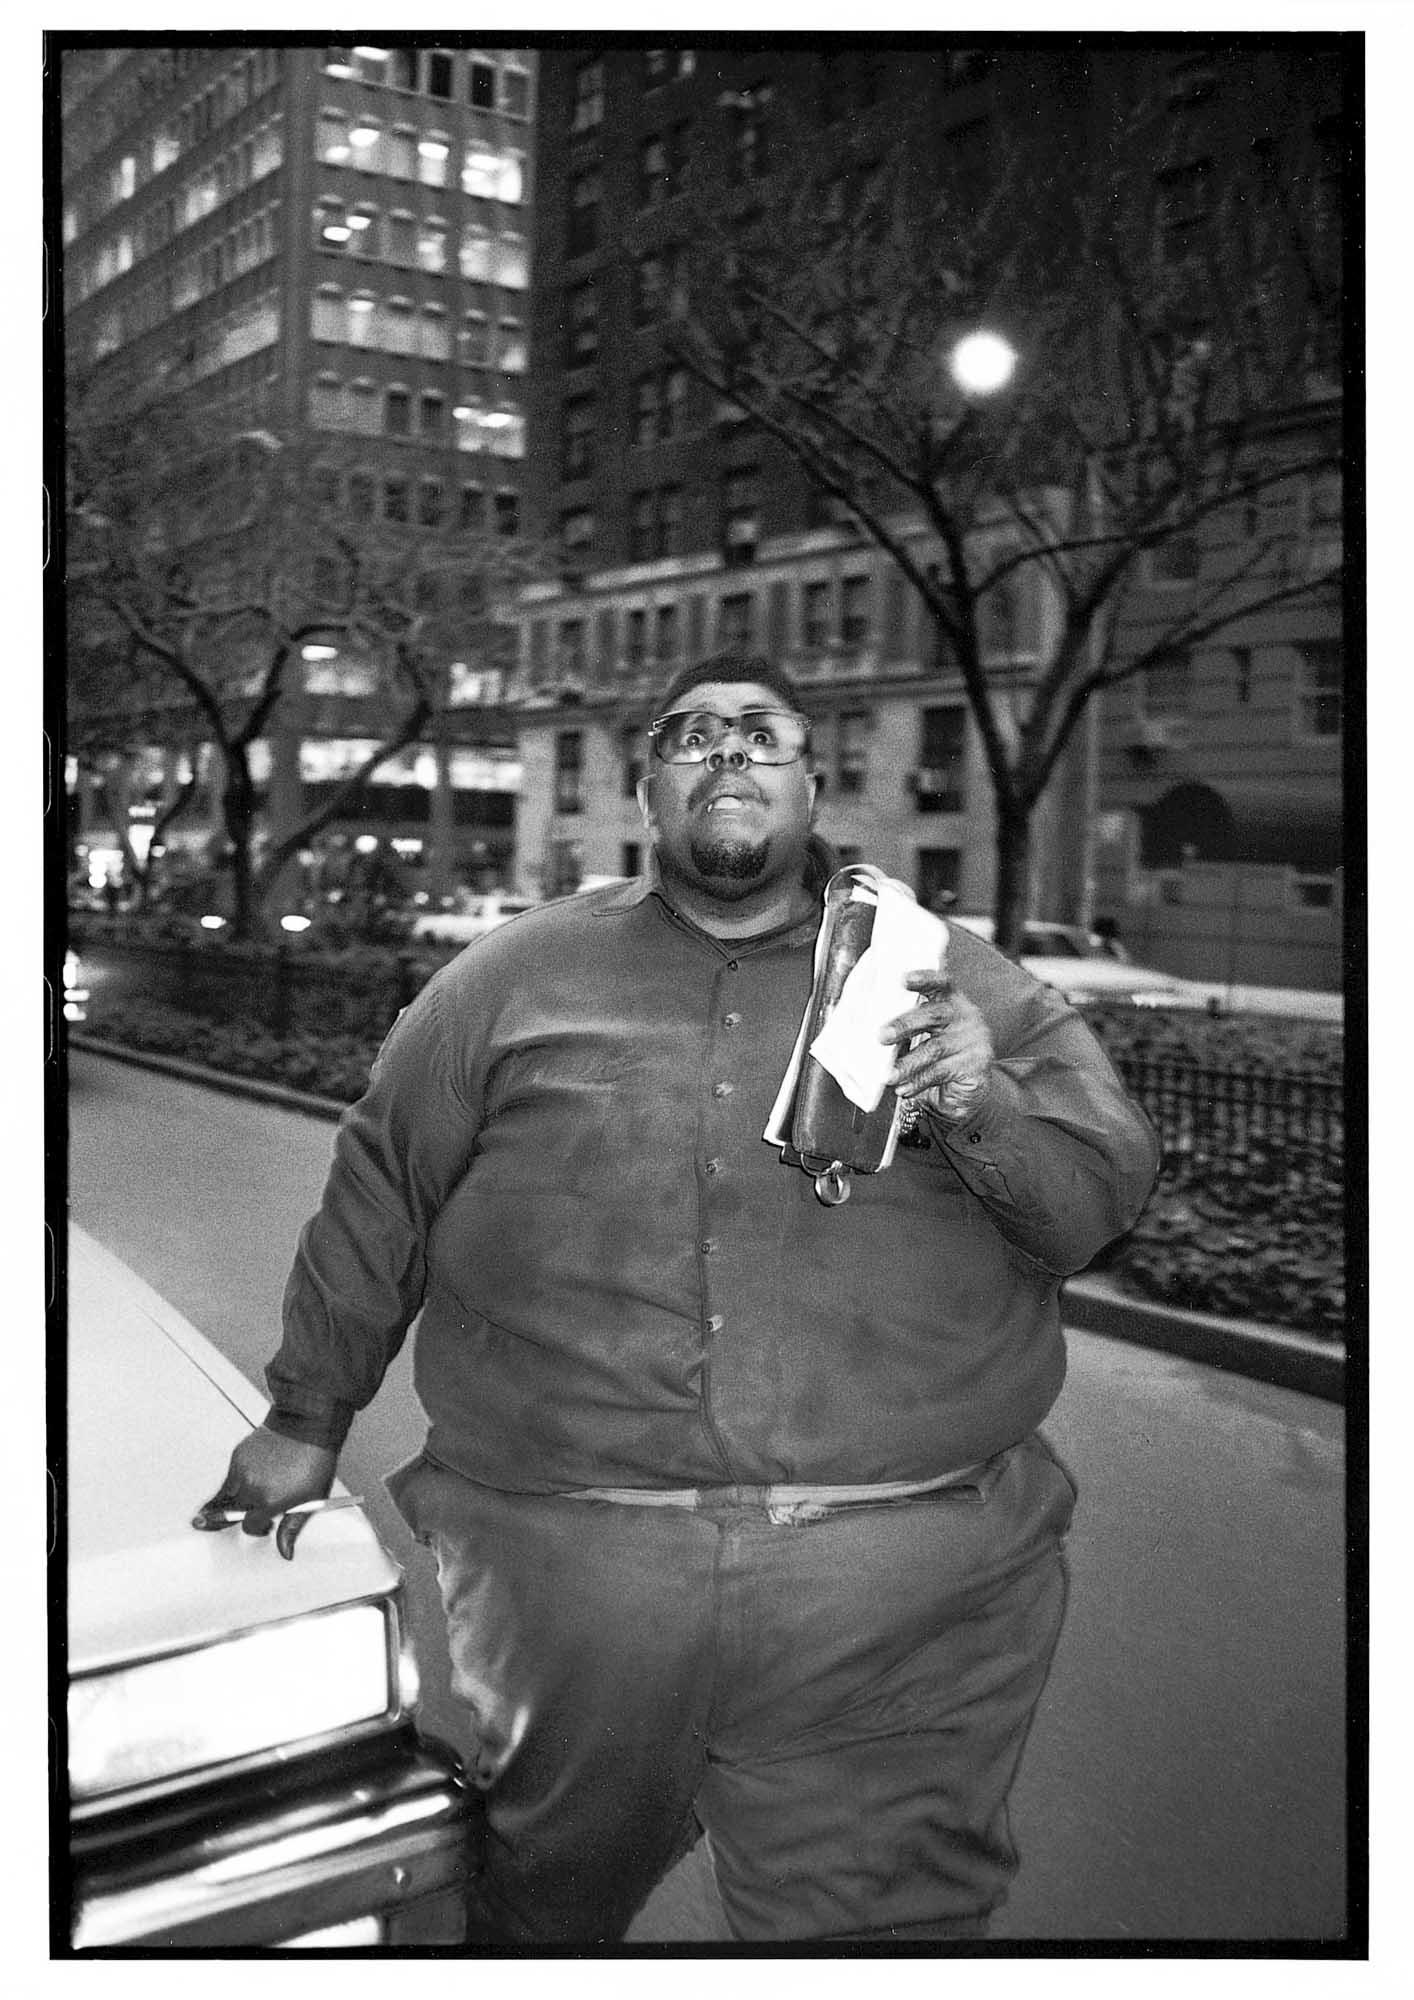 WilliamHeydt-Photographs-C3437-33.jpg